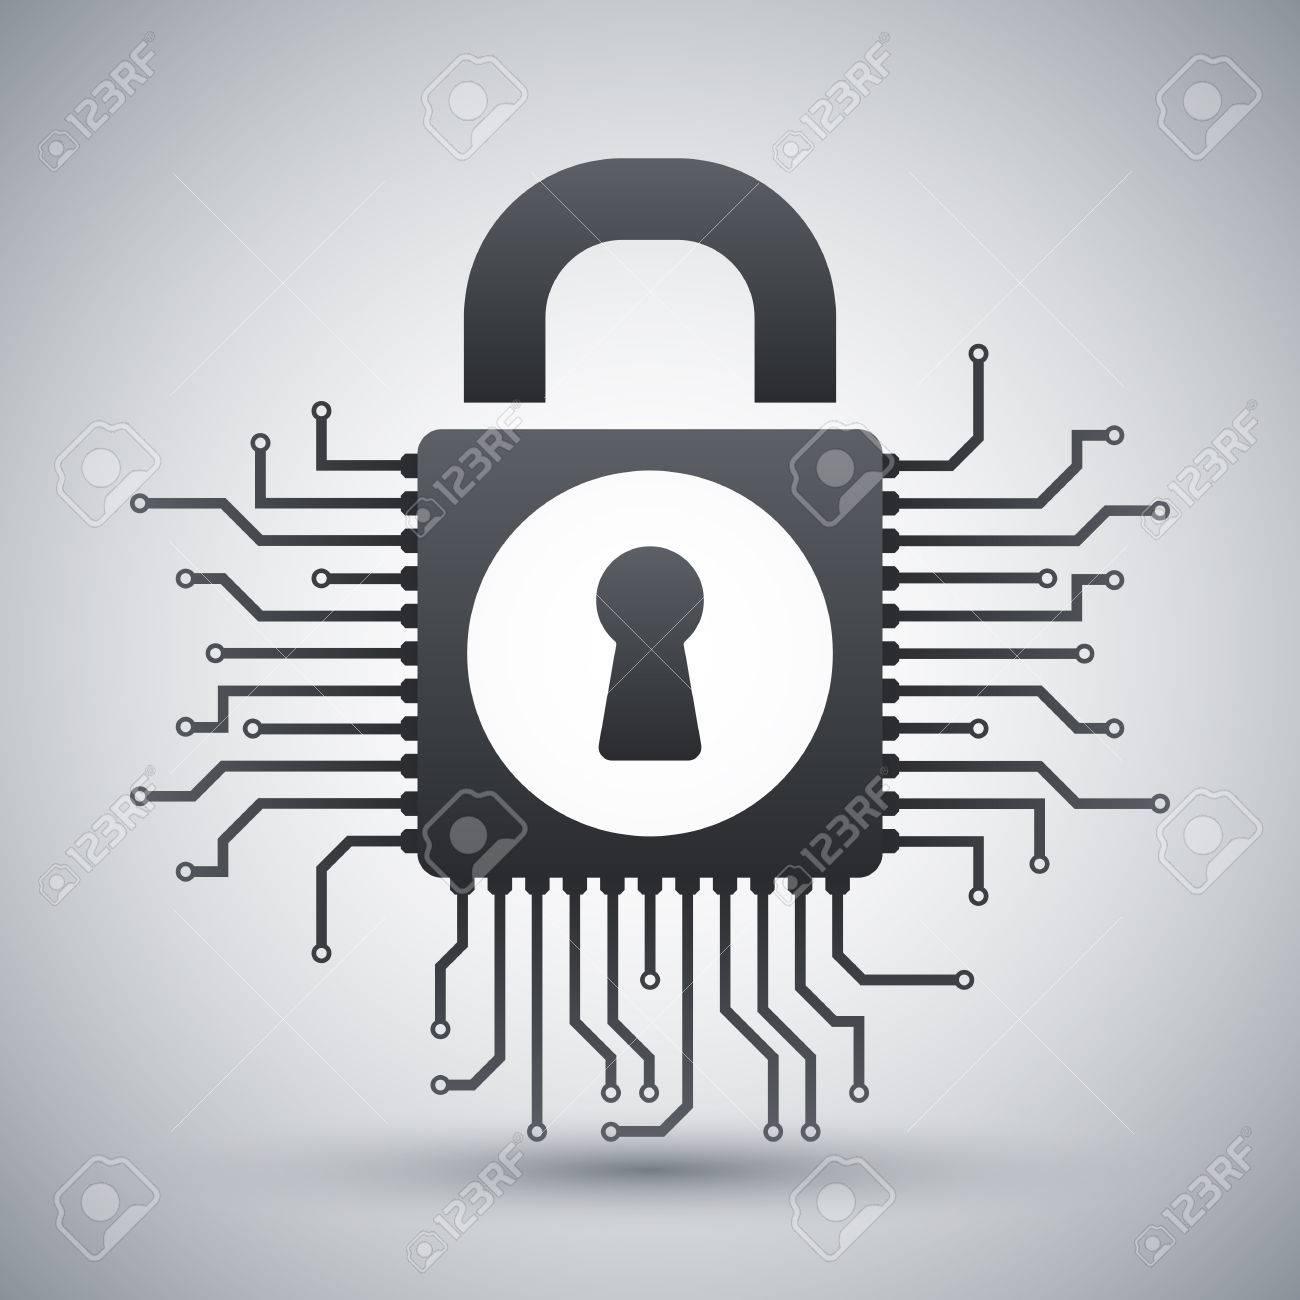 information security concept icon - 50904131